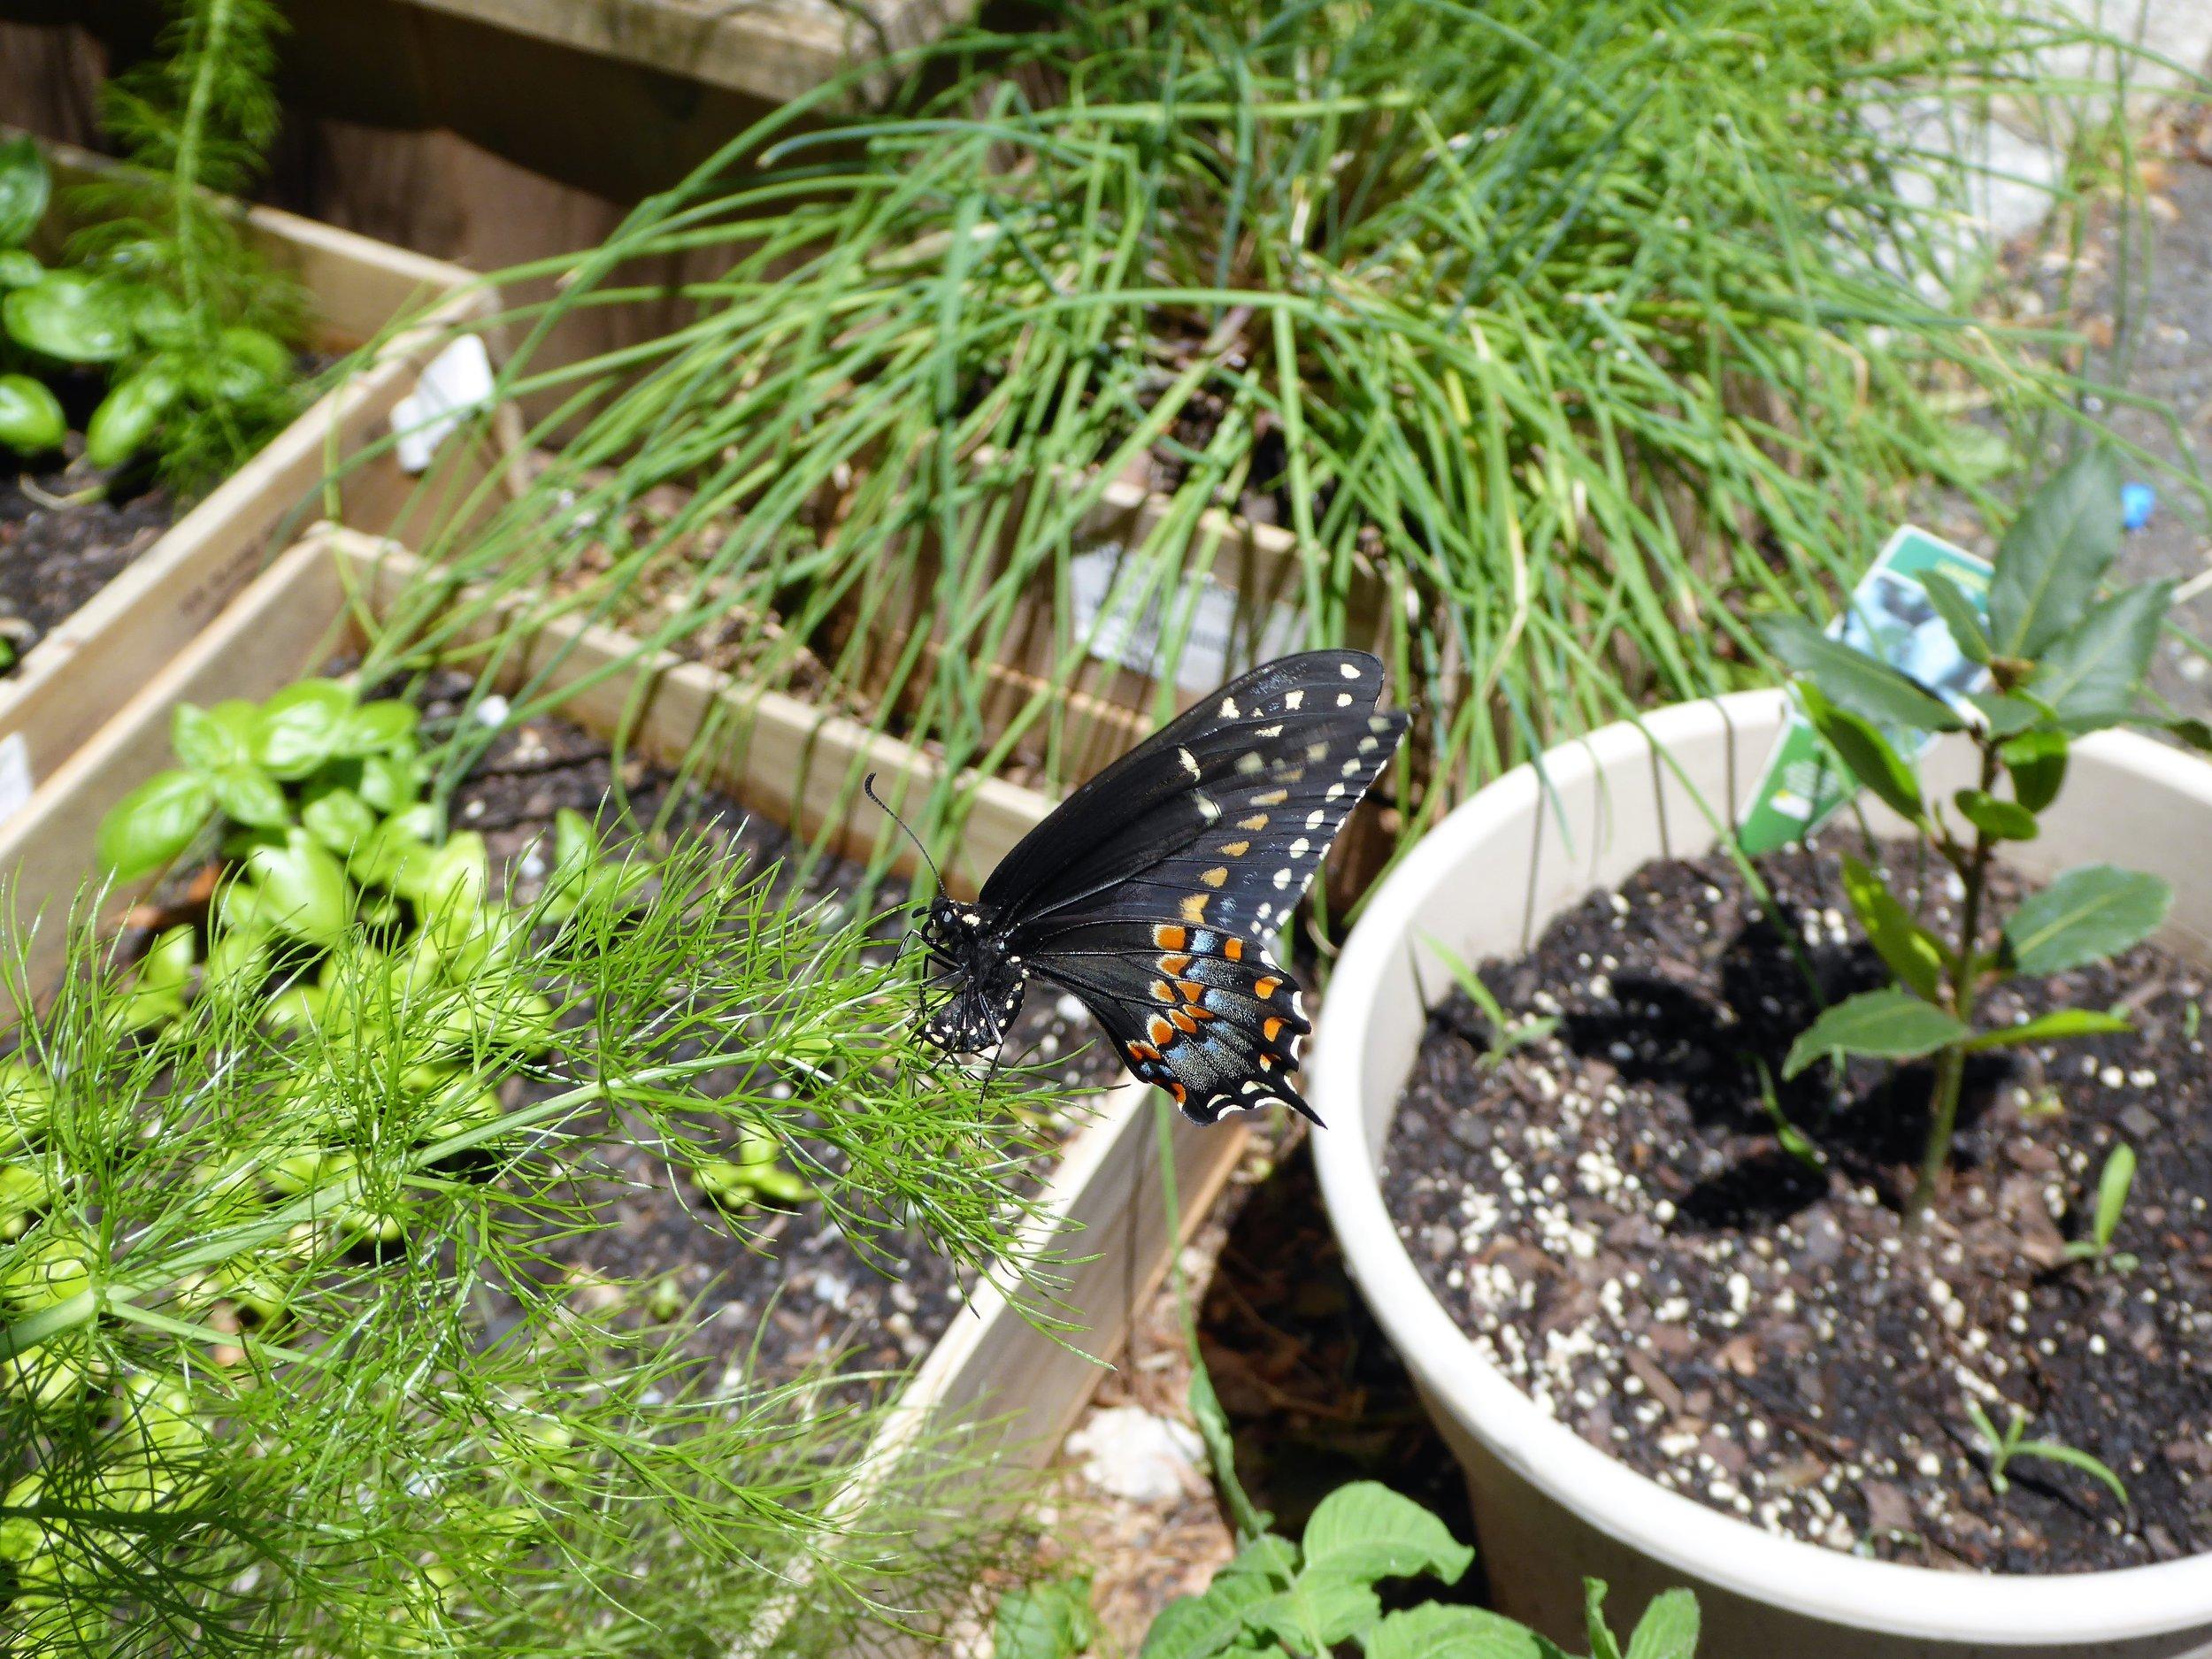 Tiger Swallowtail visits the garden